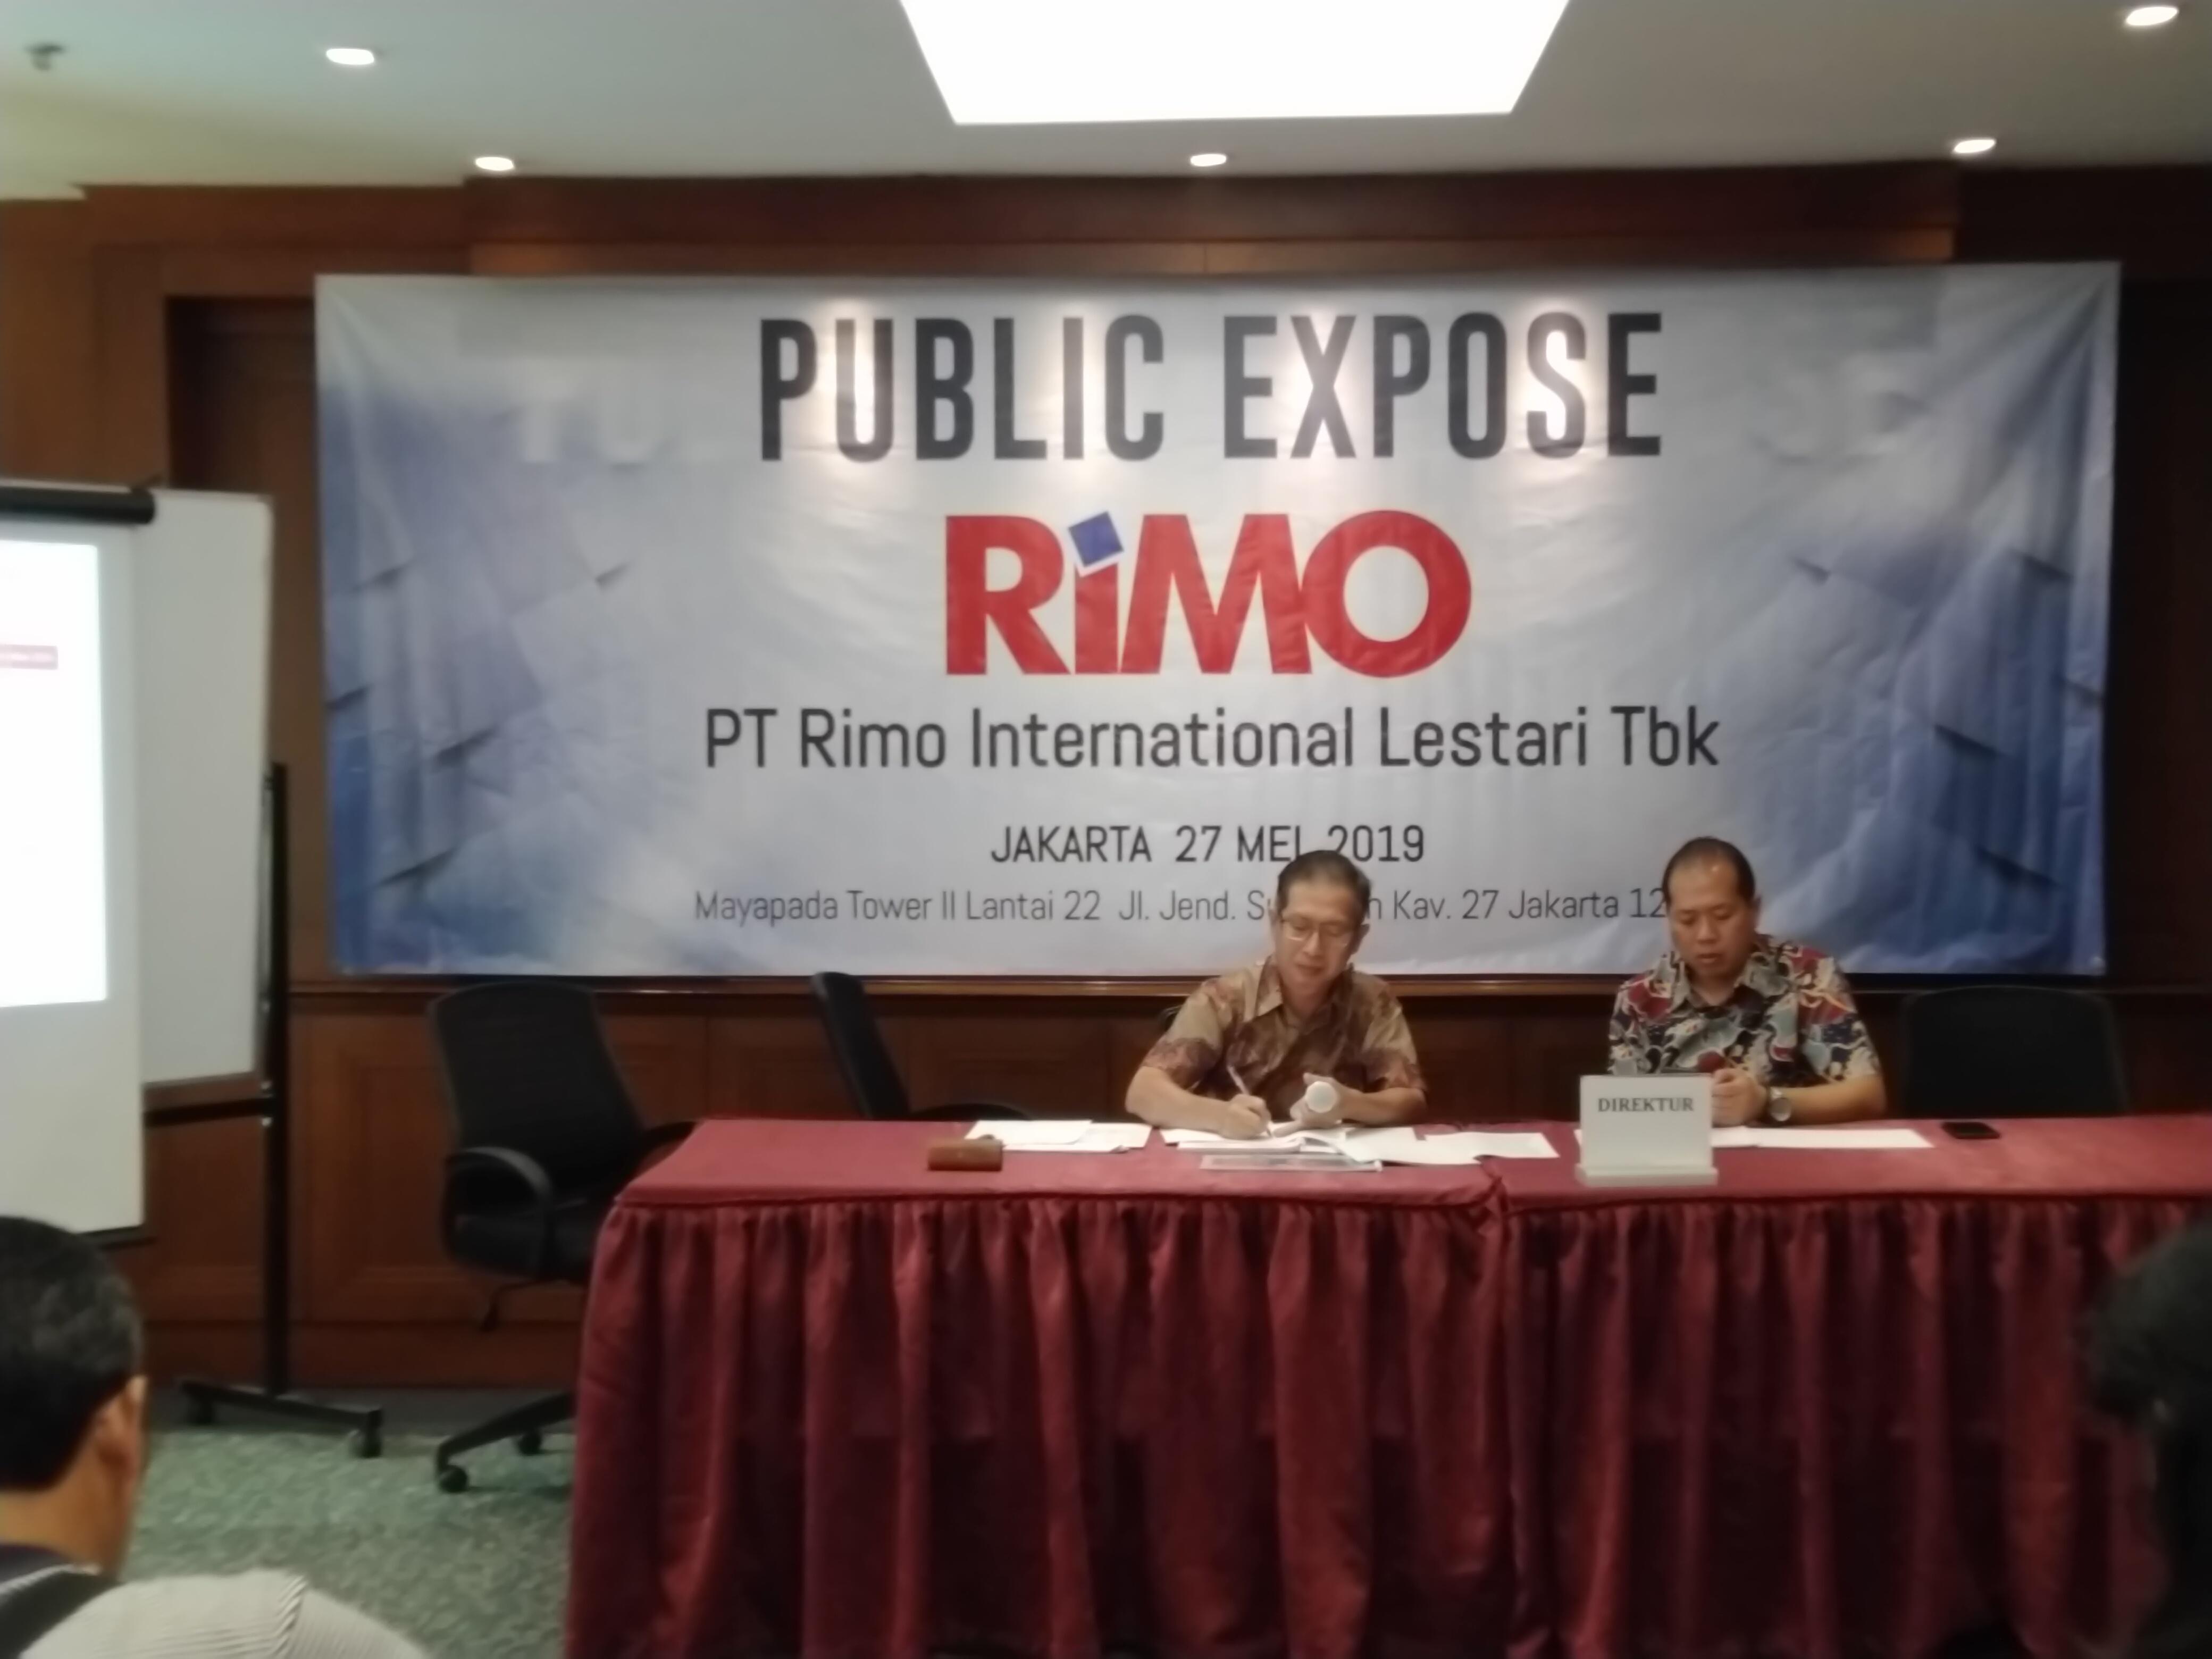 RIMO Sejumlah Proyek Rimo International Lestari (RIMO) Terbengkalai, Kenapa?